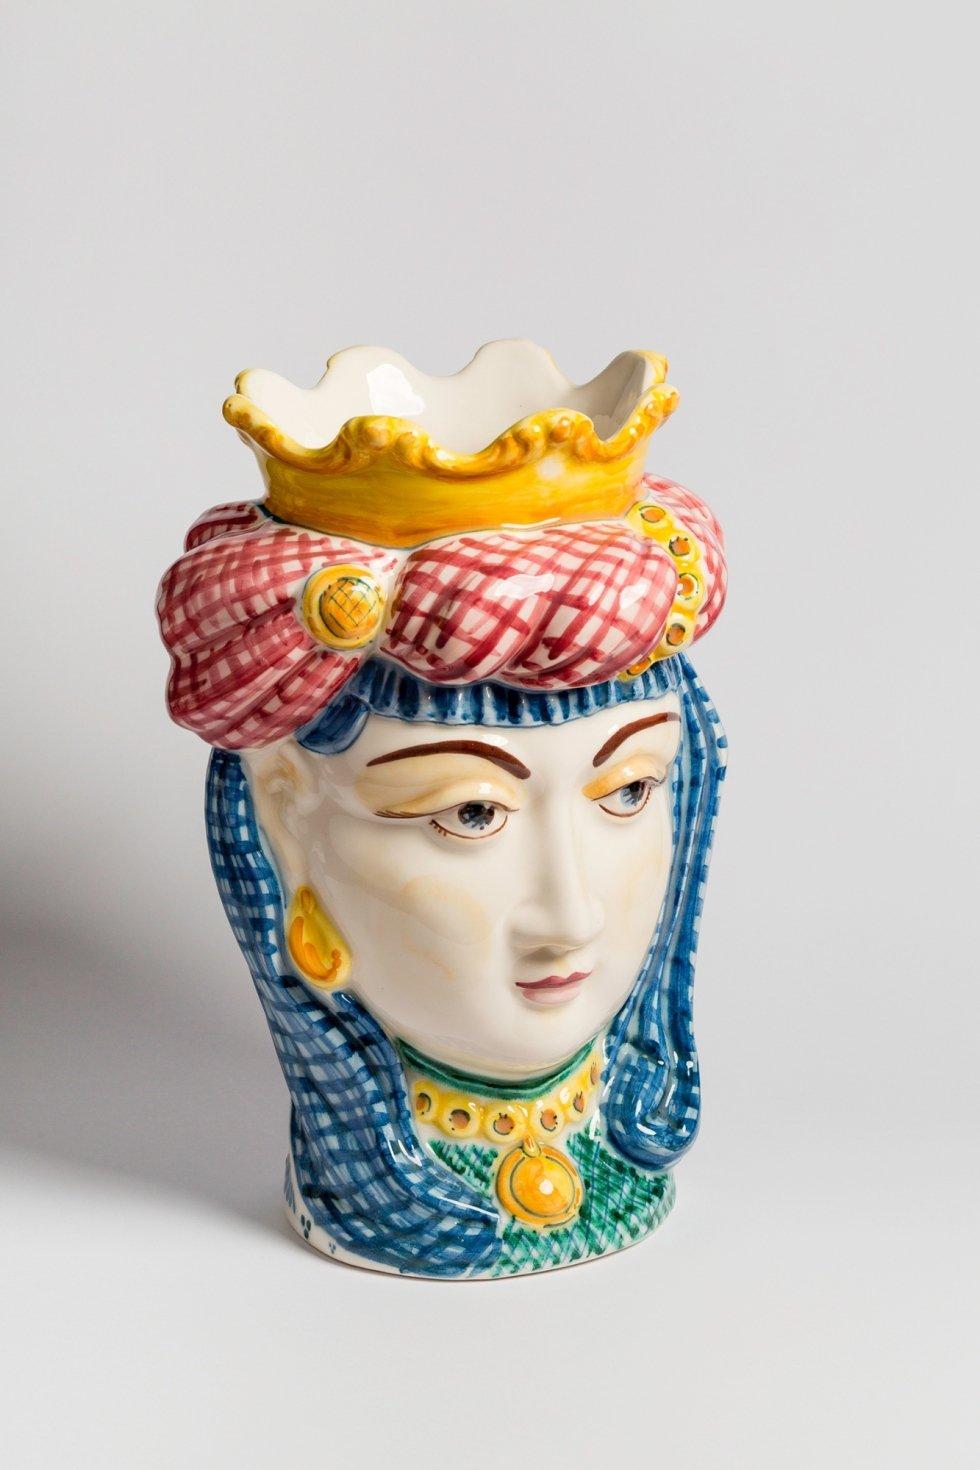 ceramica decorata a mano